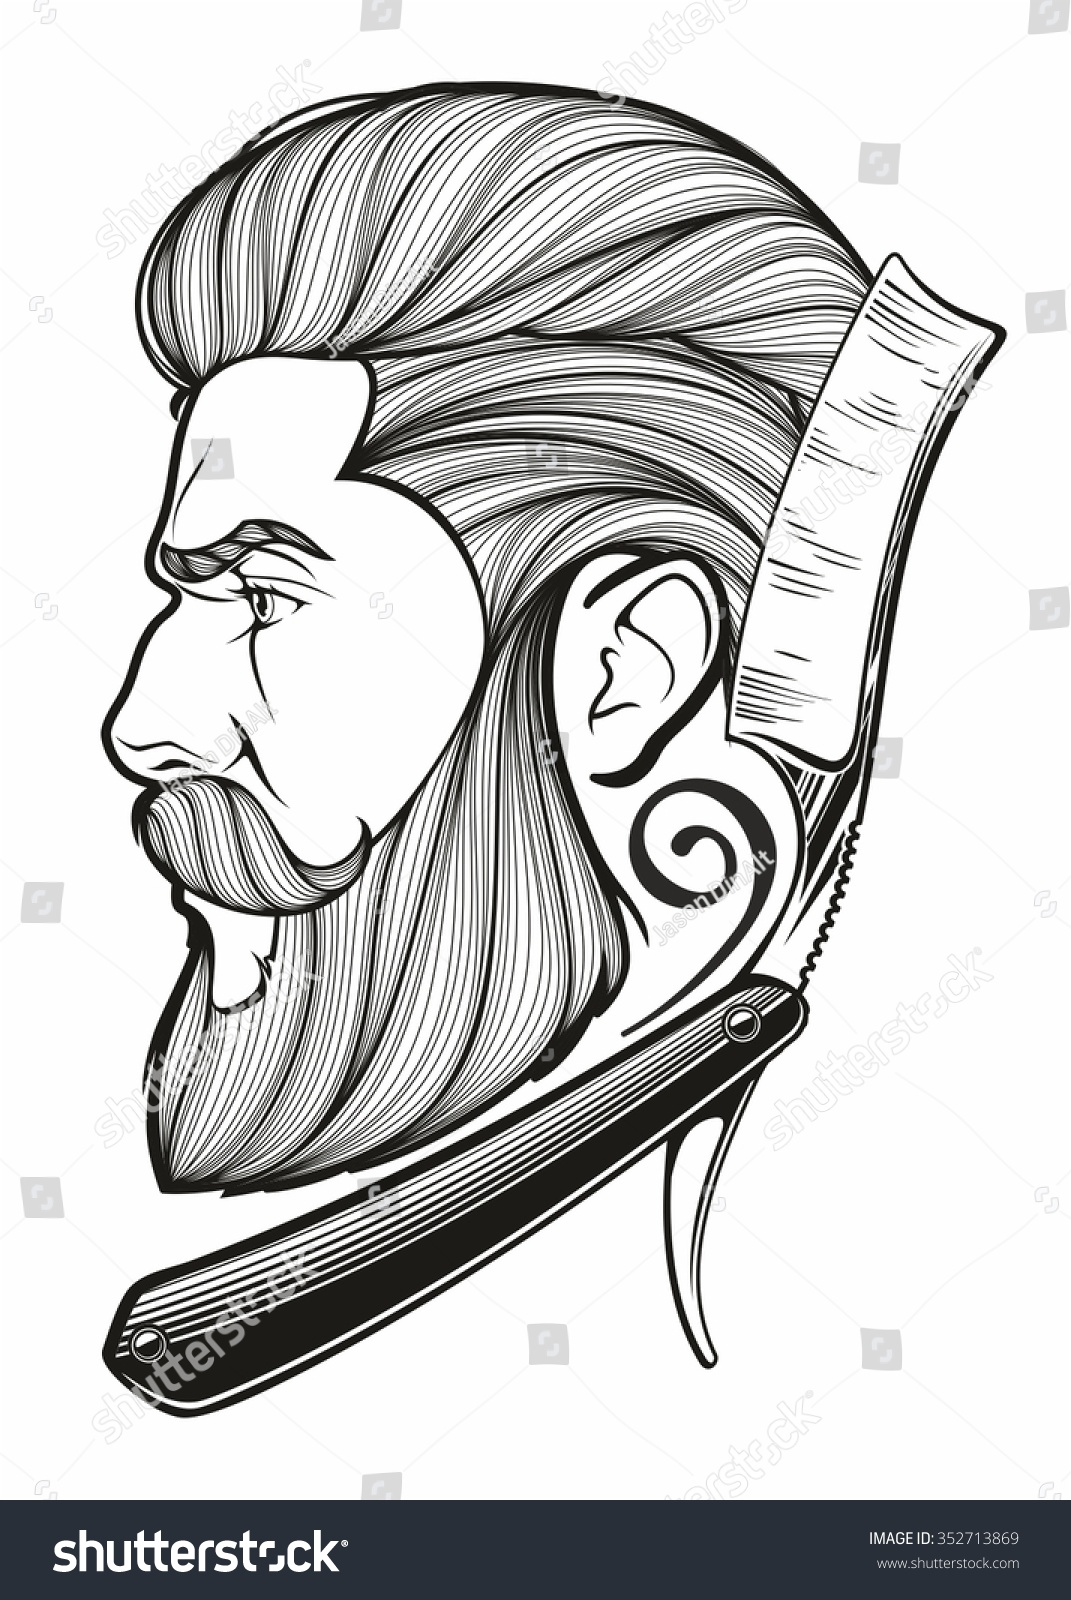 Vintage Hand Drawn Logo Barber Shop Stock Vector 352713869